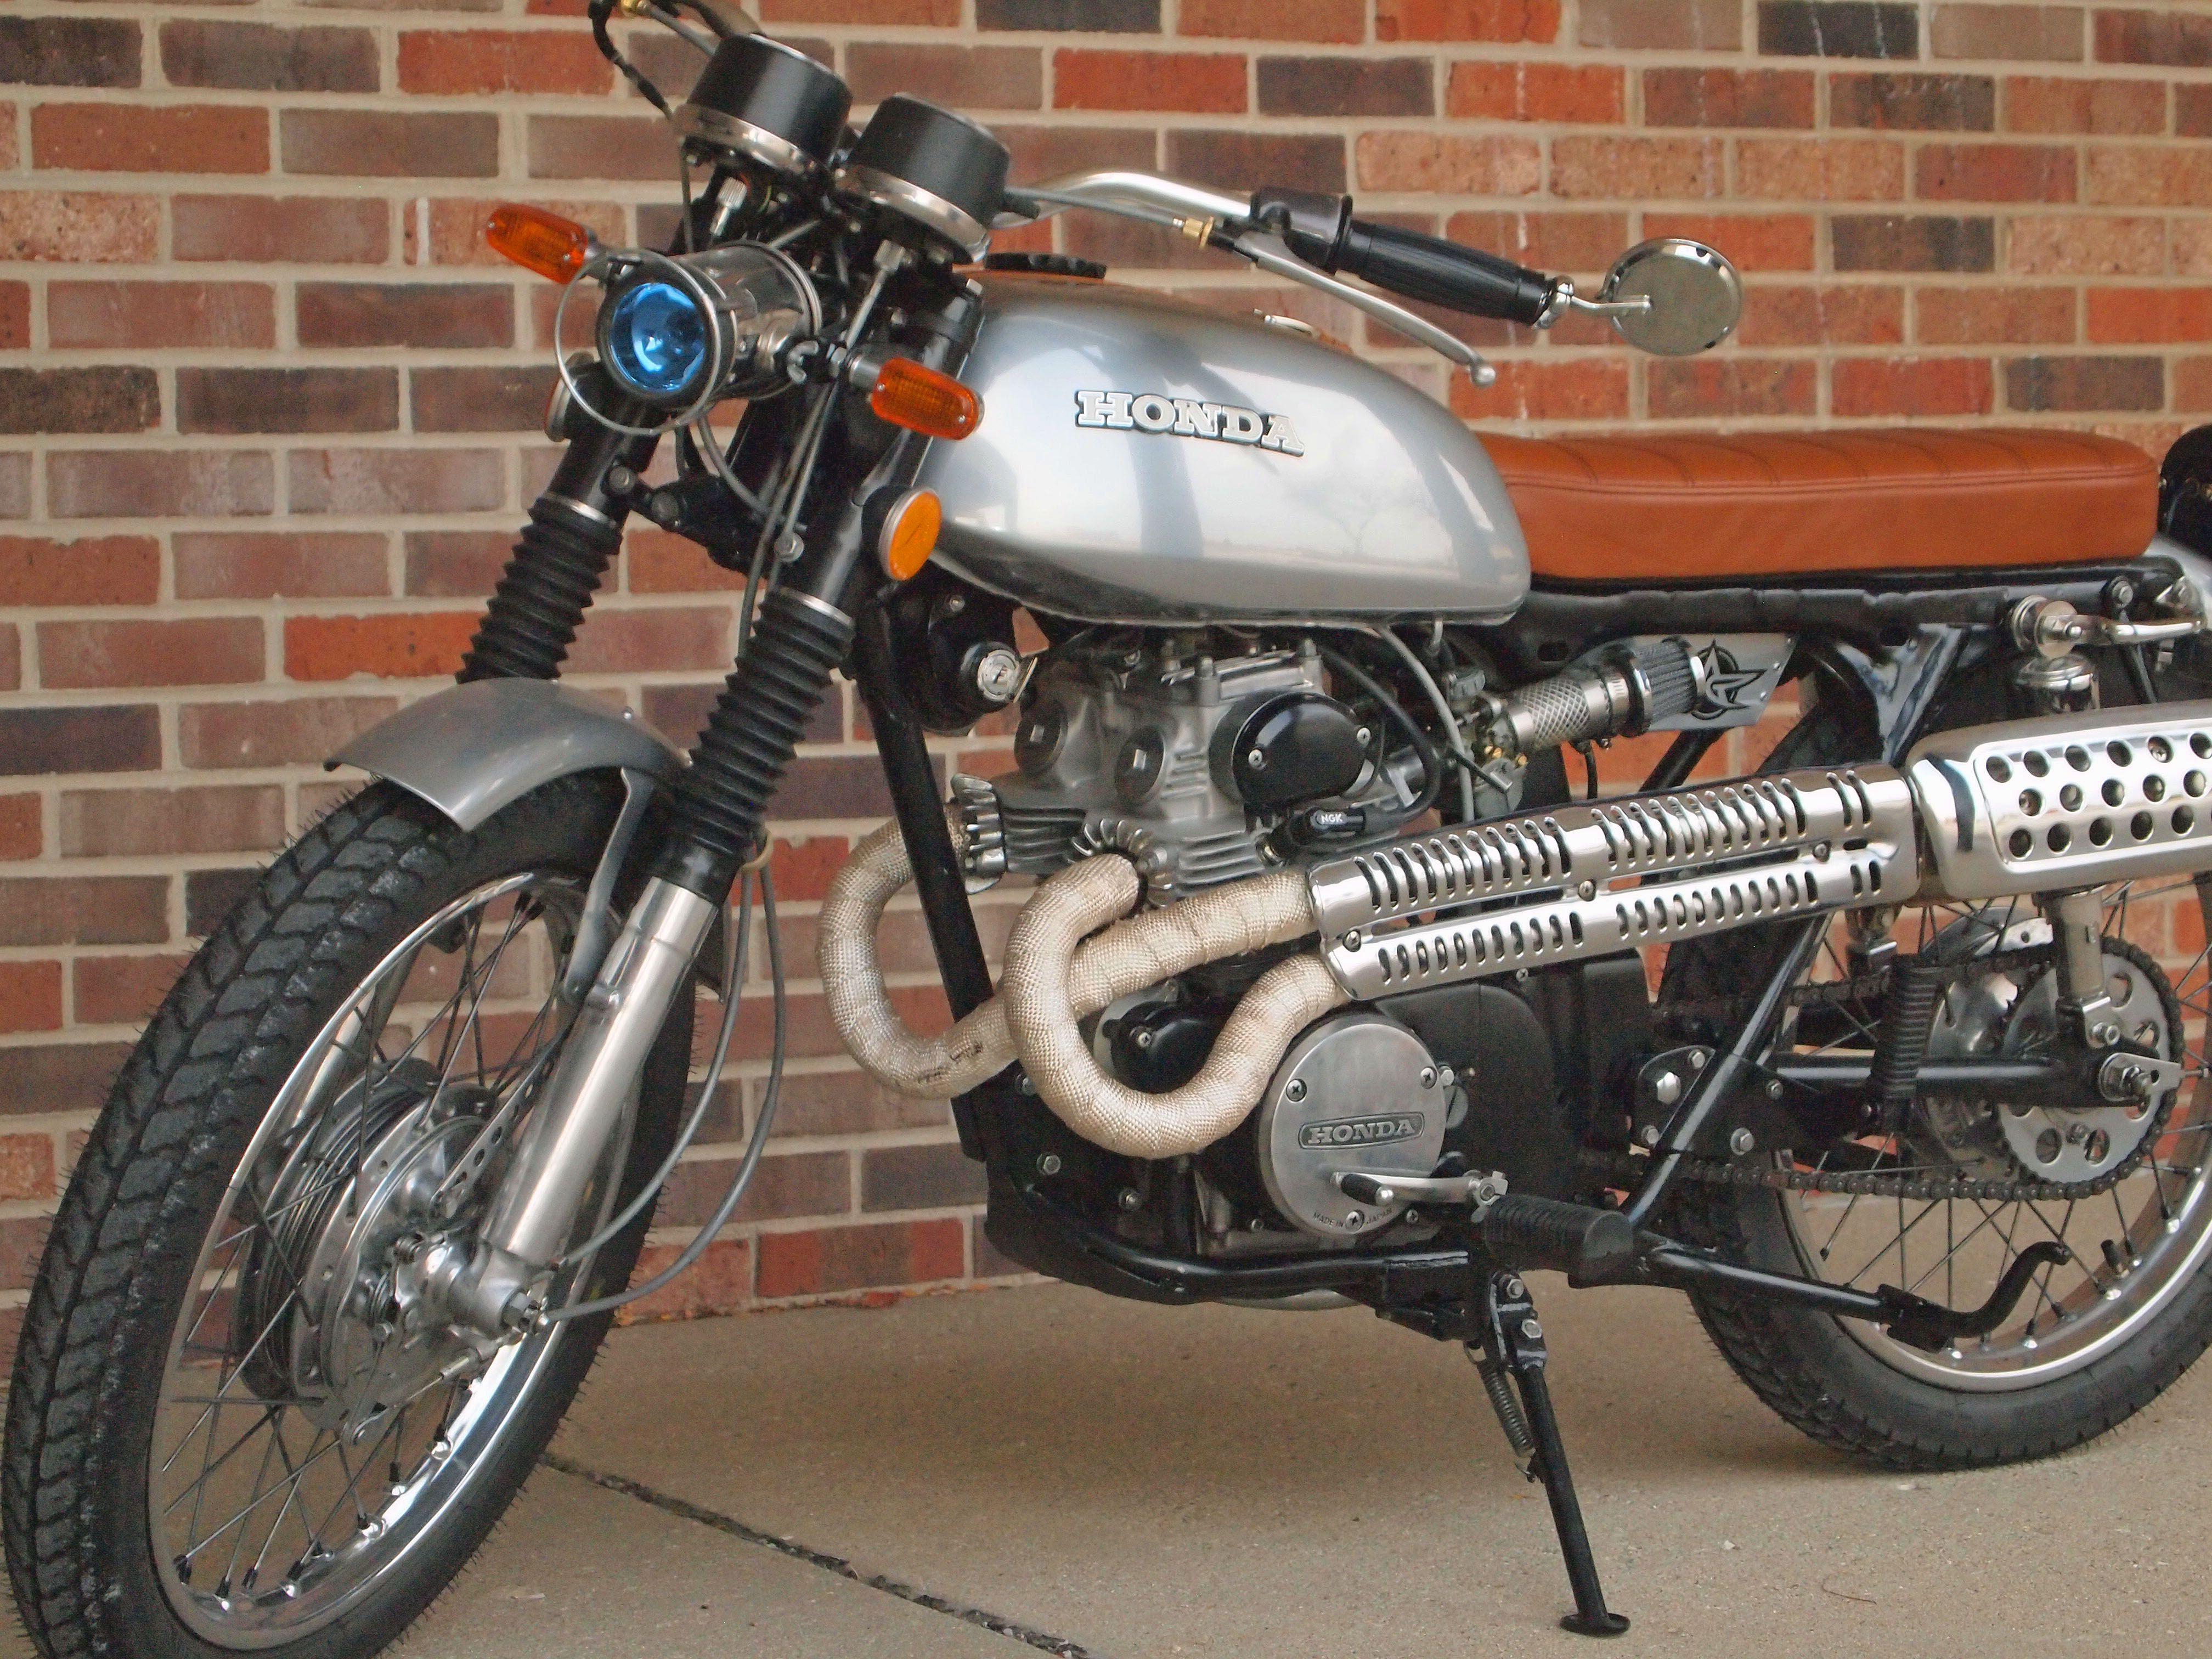 1973 Honda Cl175 Little Patina Analog Motorcycles Motorcycle Honda Scrambler Honda [ 3024 x 4032 Pixel ]